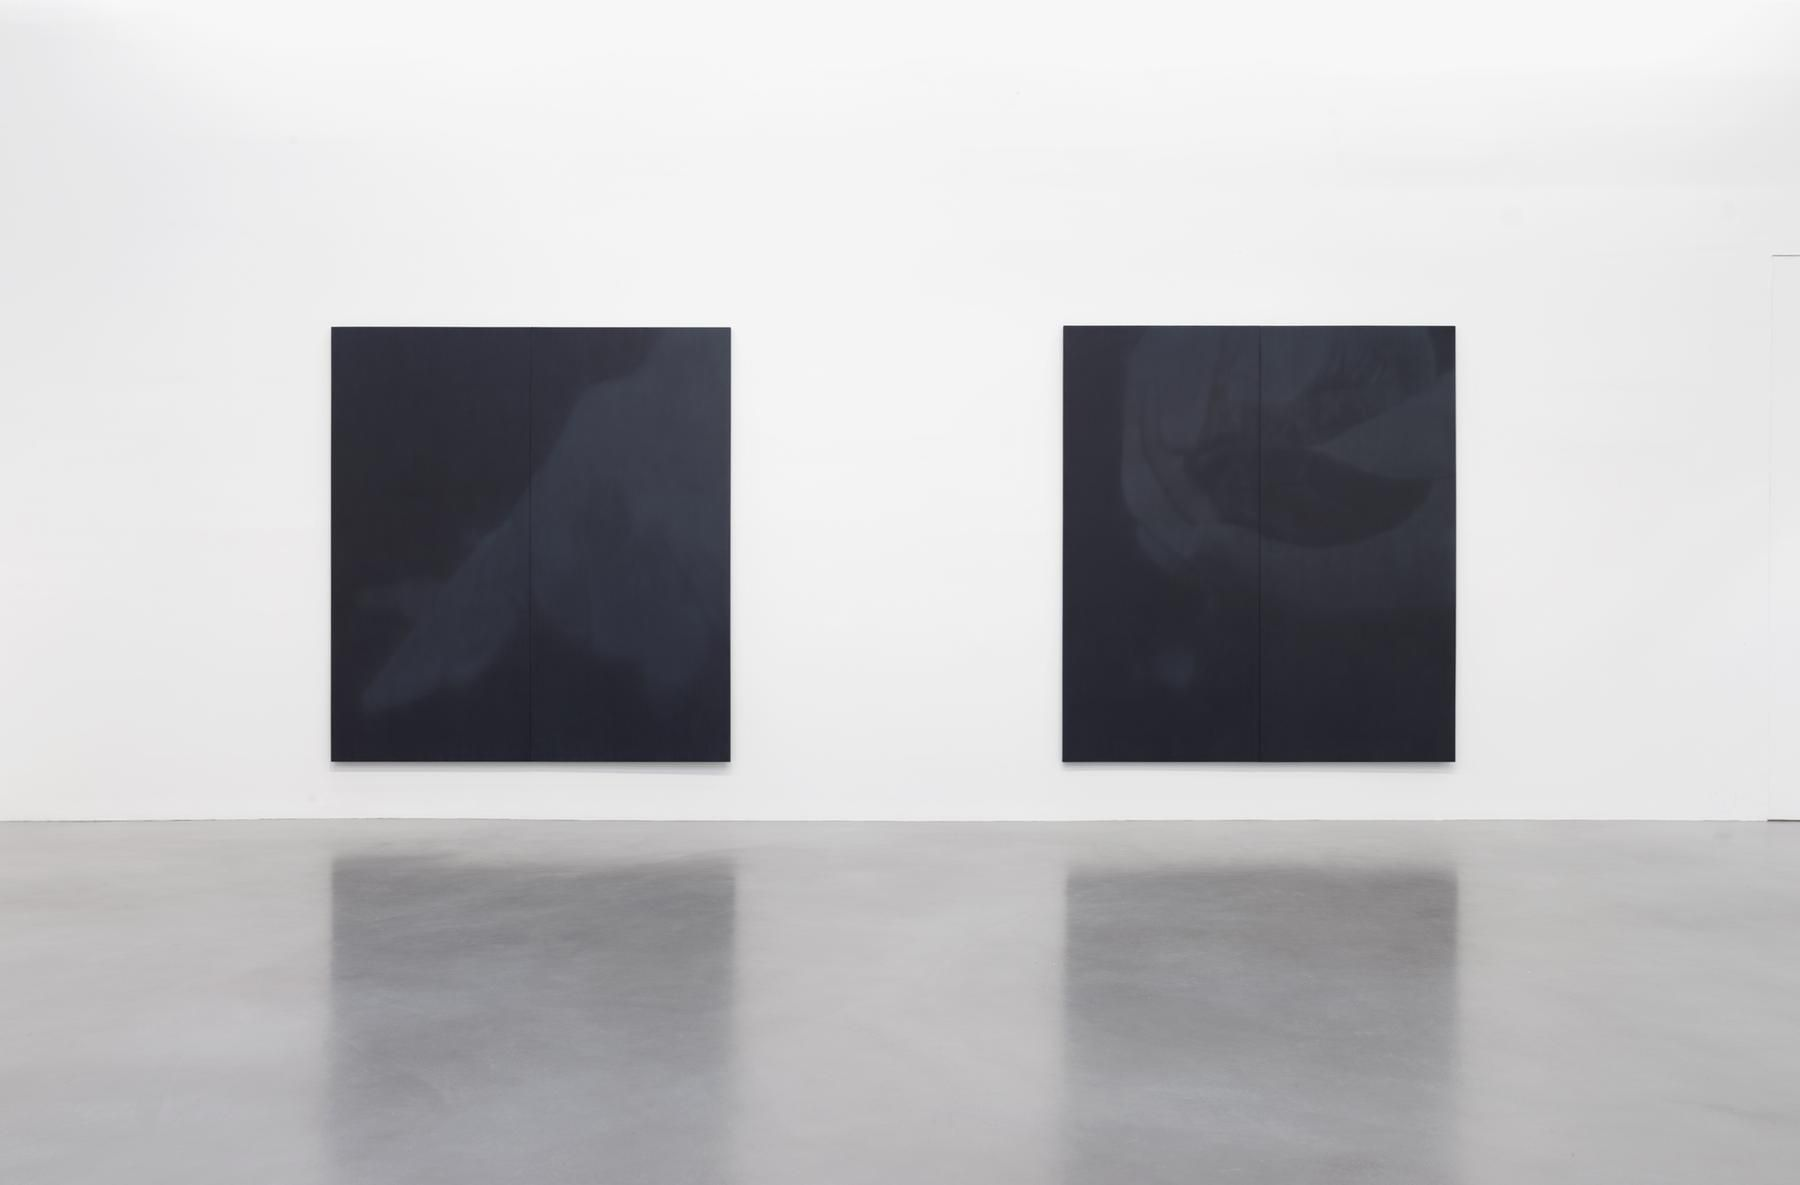 Troy Brauntuch Installation view 14